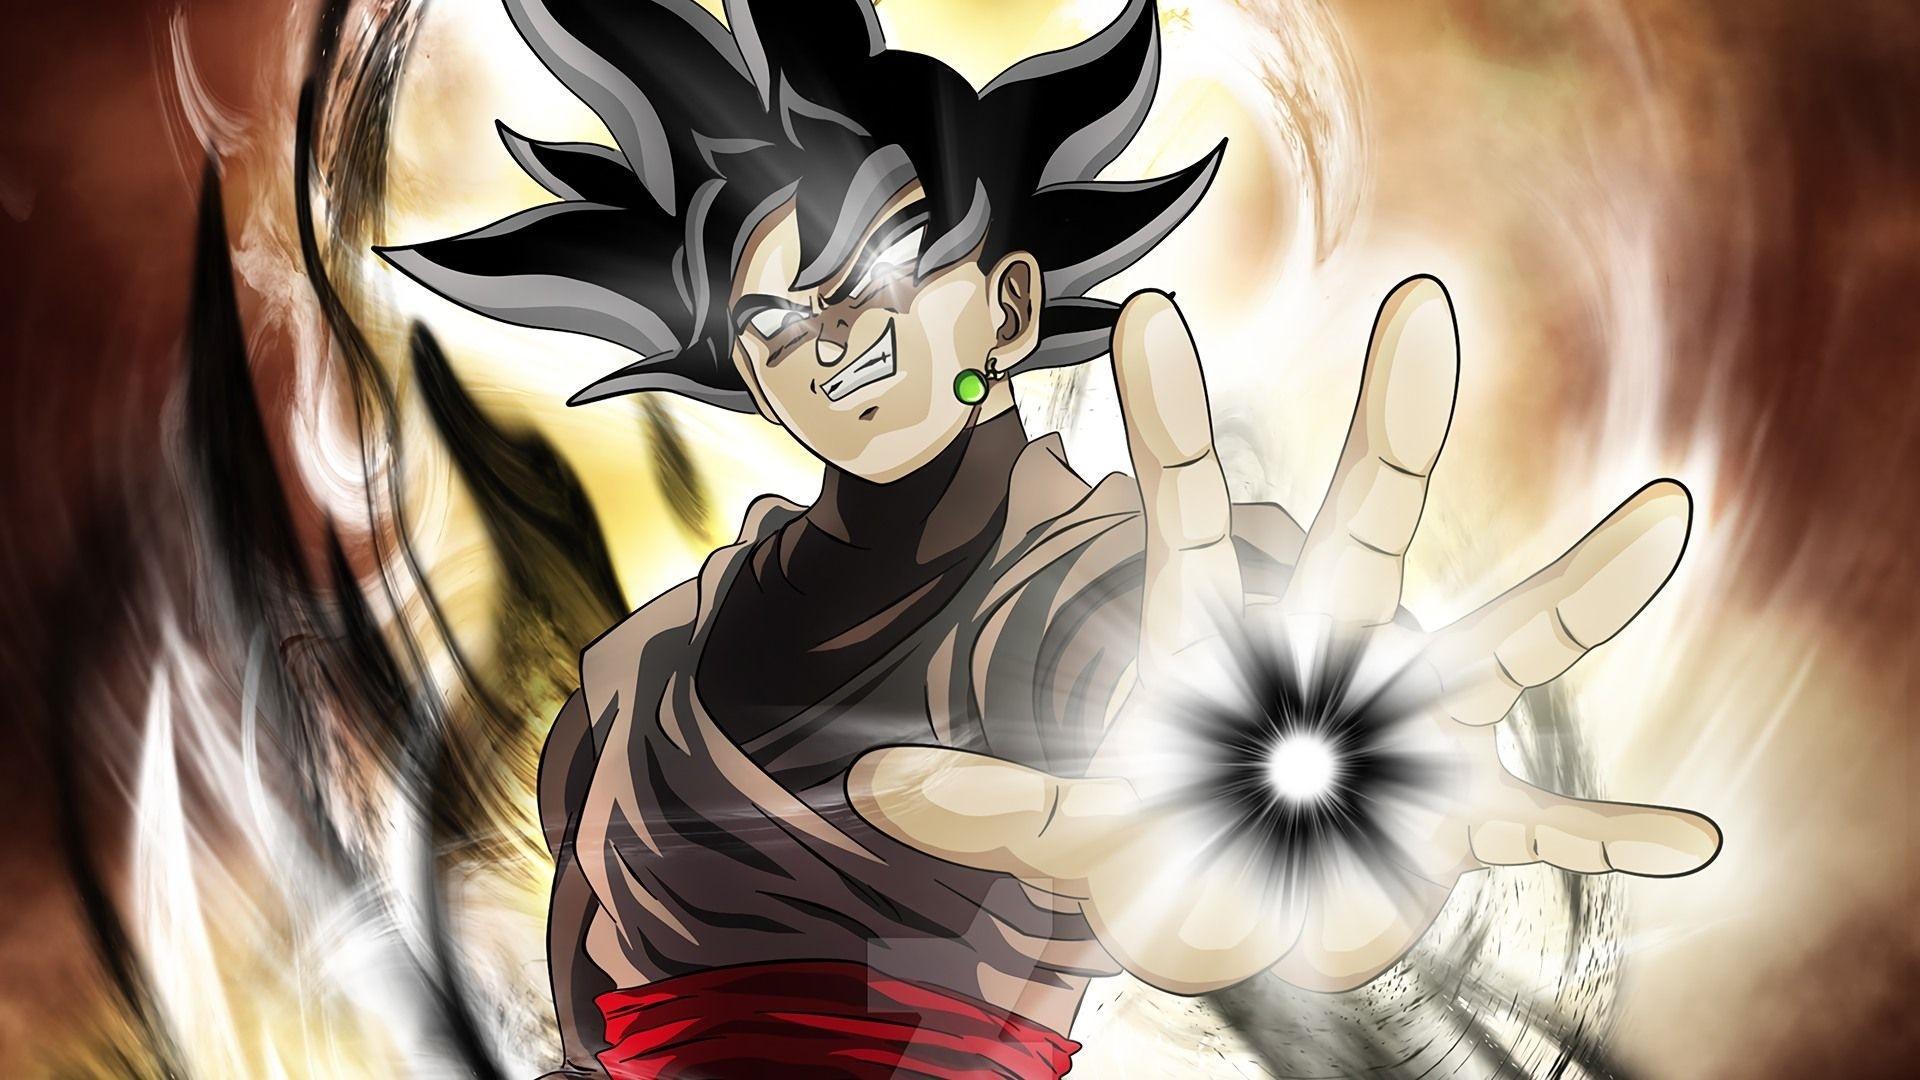 Goku Black cool wallpaper